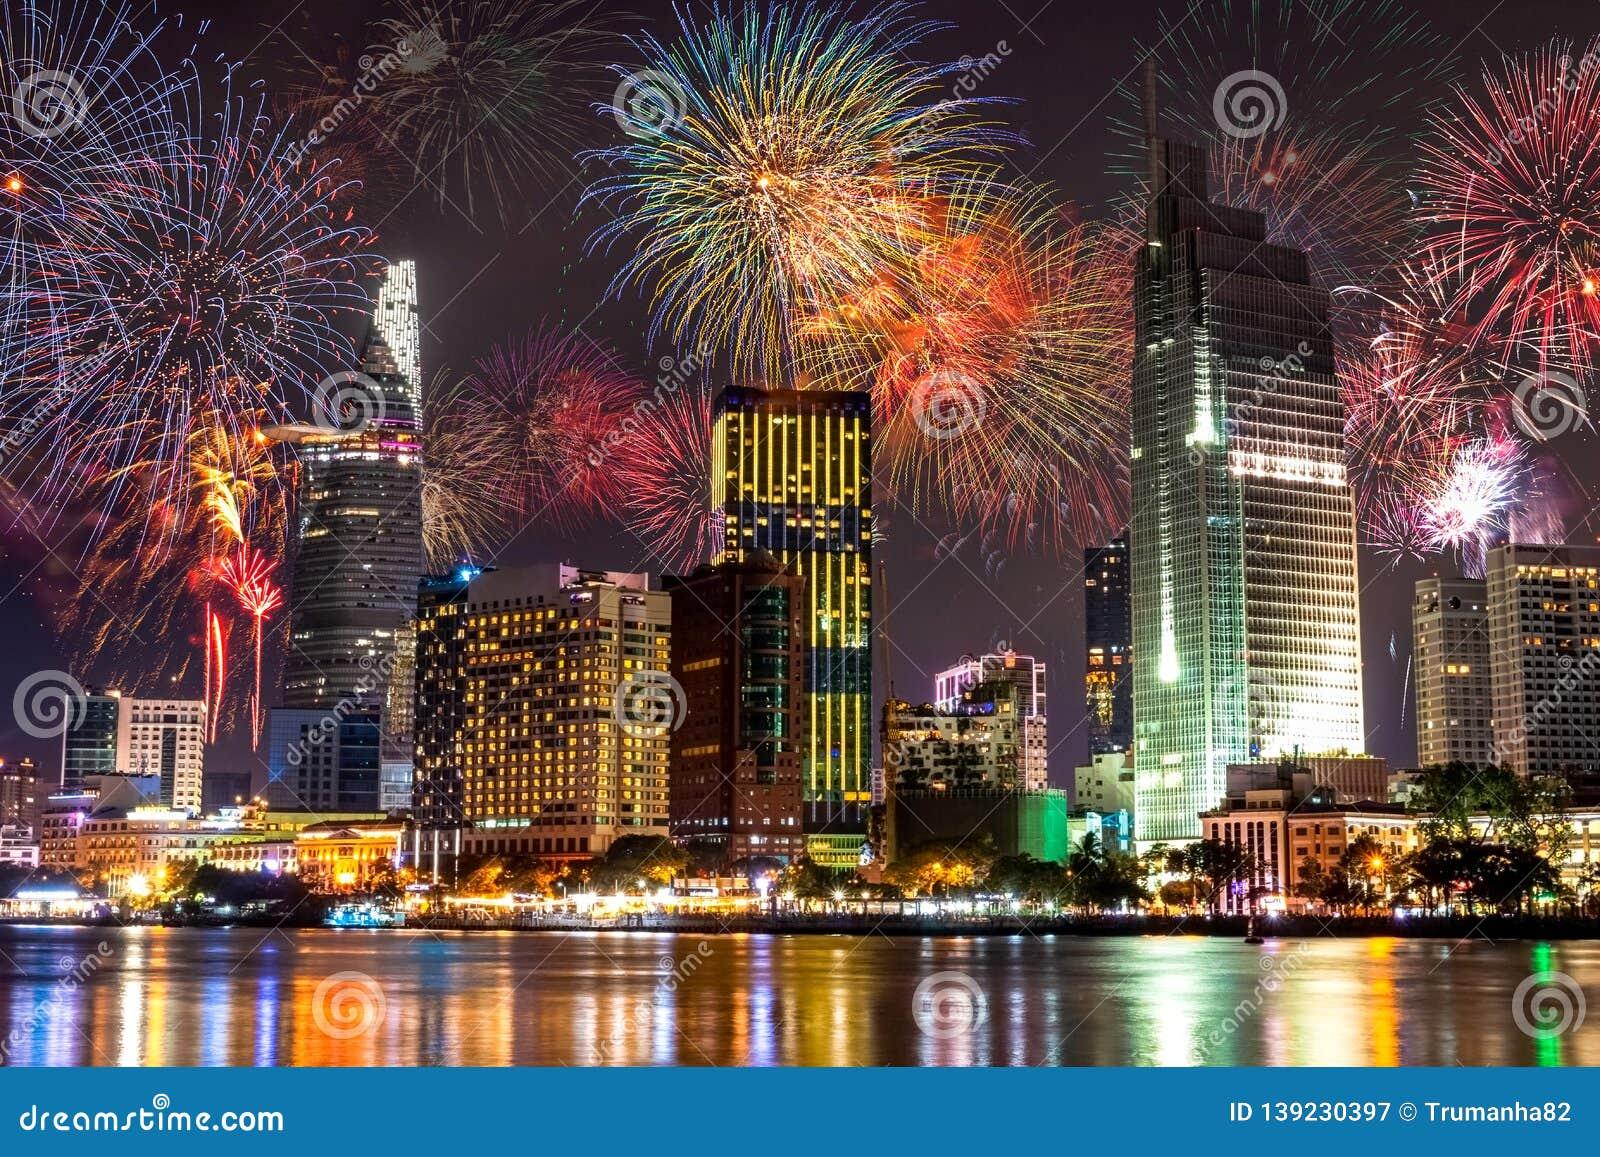 Fireworks Bursting in The City